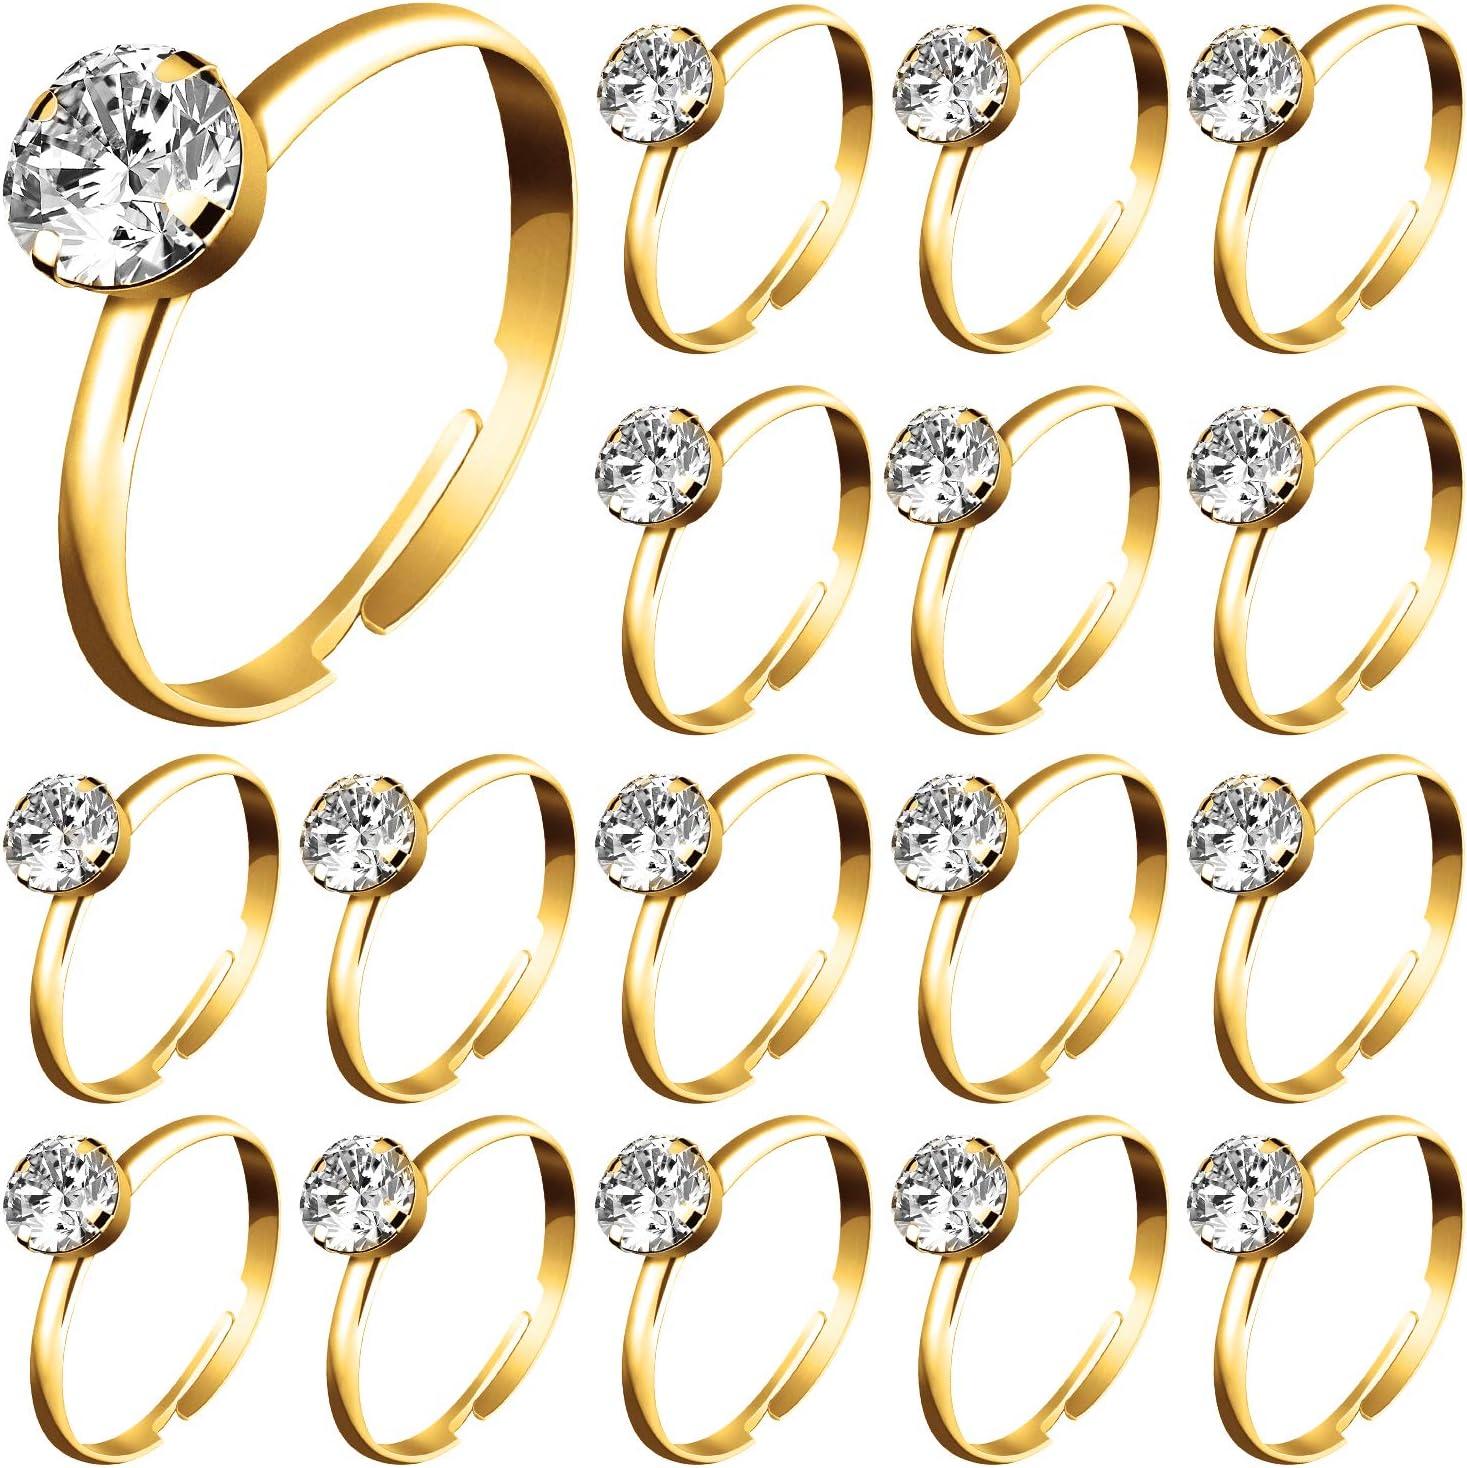 bridal shower bar supplies gold bands reception decorations bachelorette party gold rings wedding cocktail napkins engagement